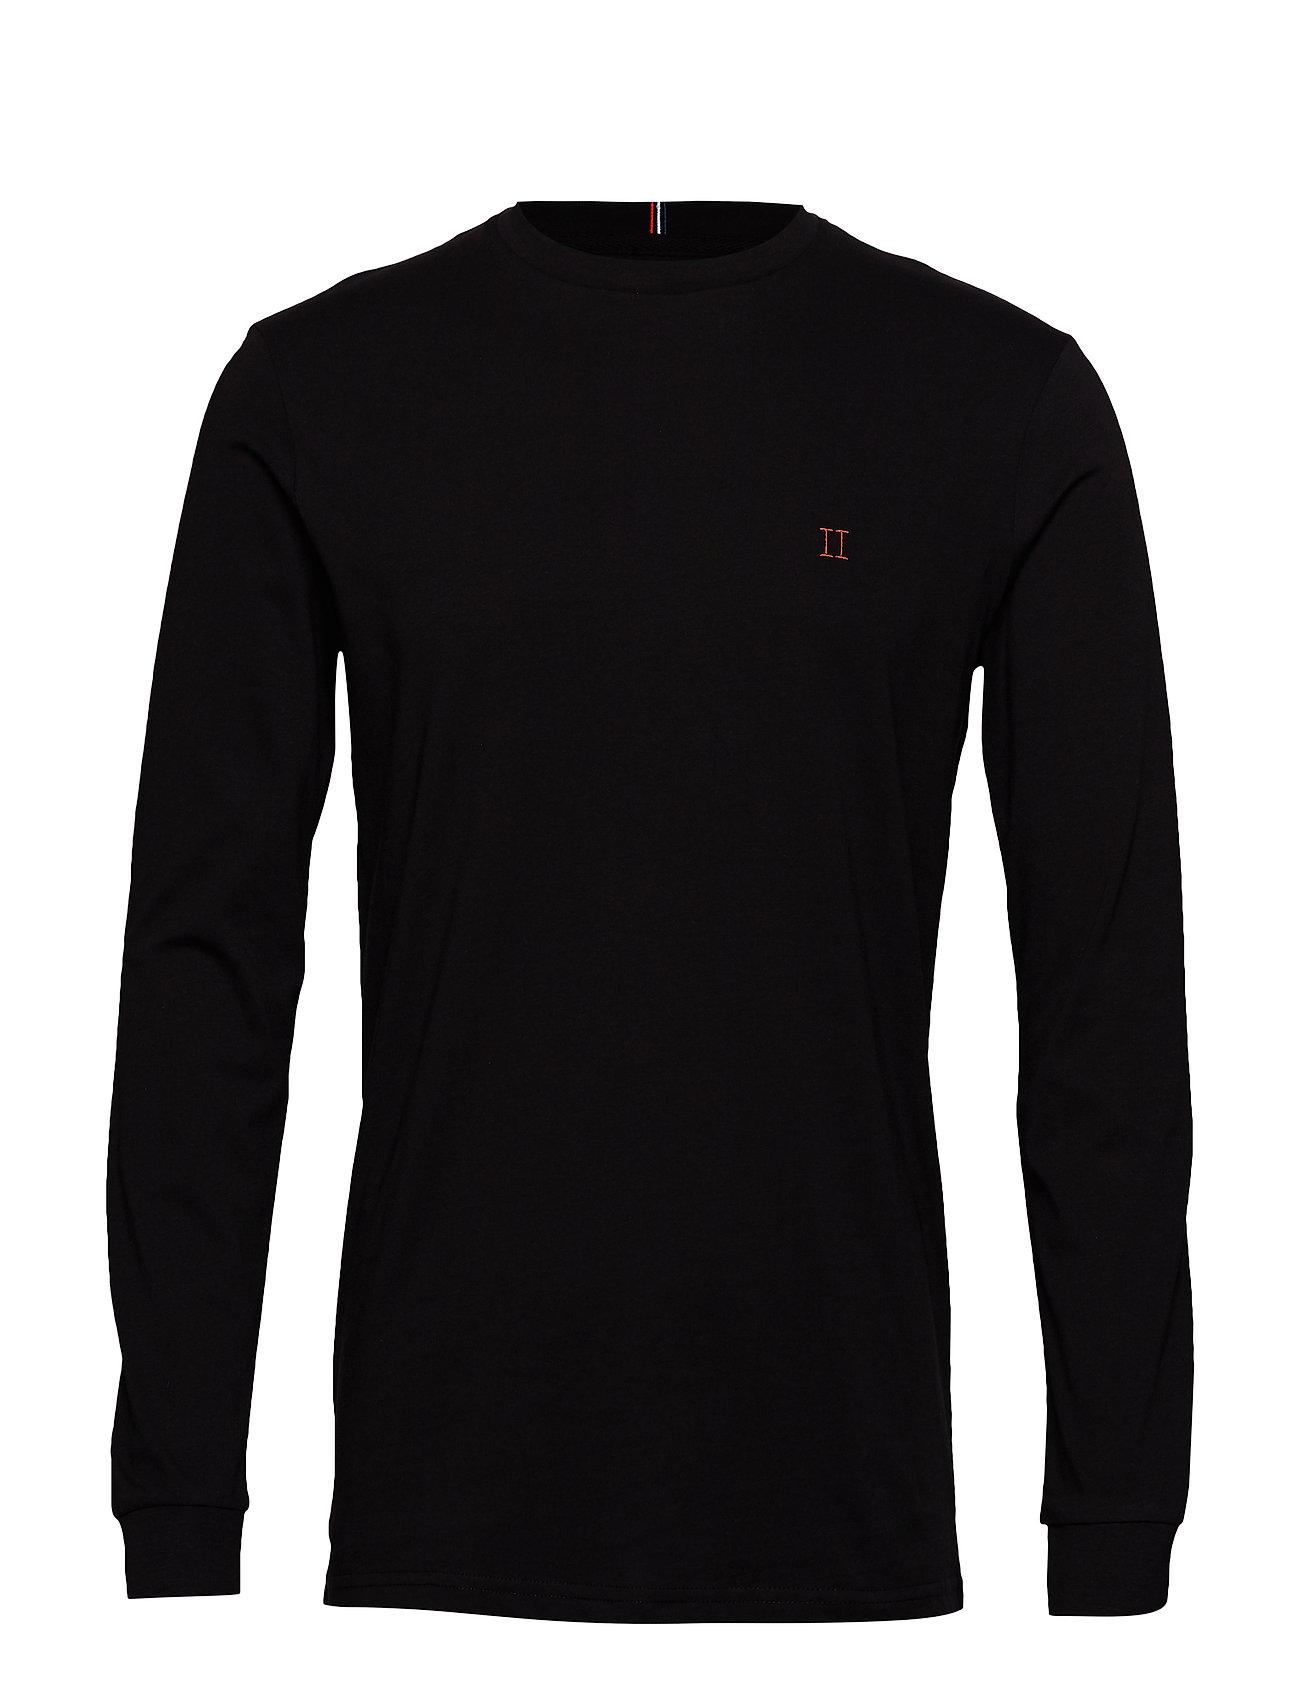 NøRregaard Ls T Shirt T Langærmet Skjorte Sort Les Deux